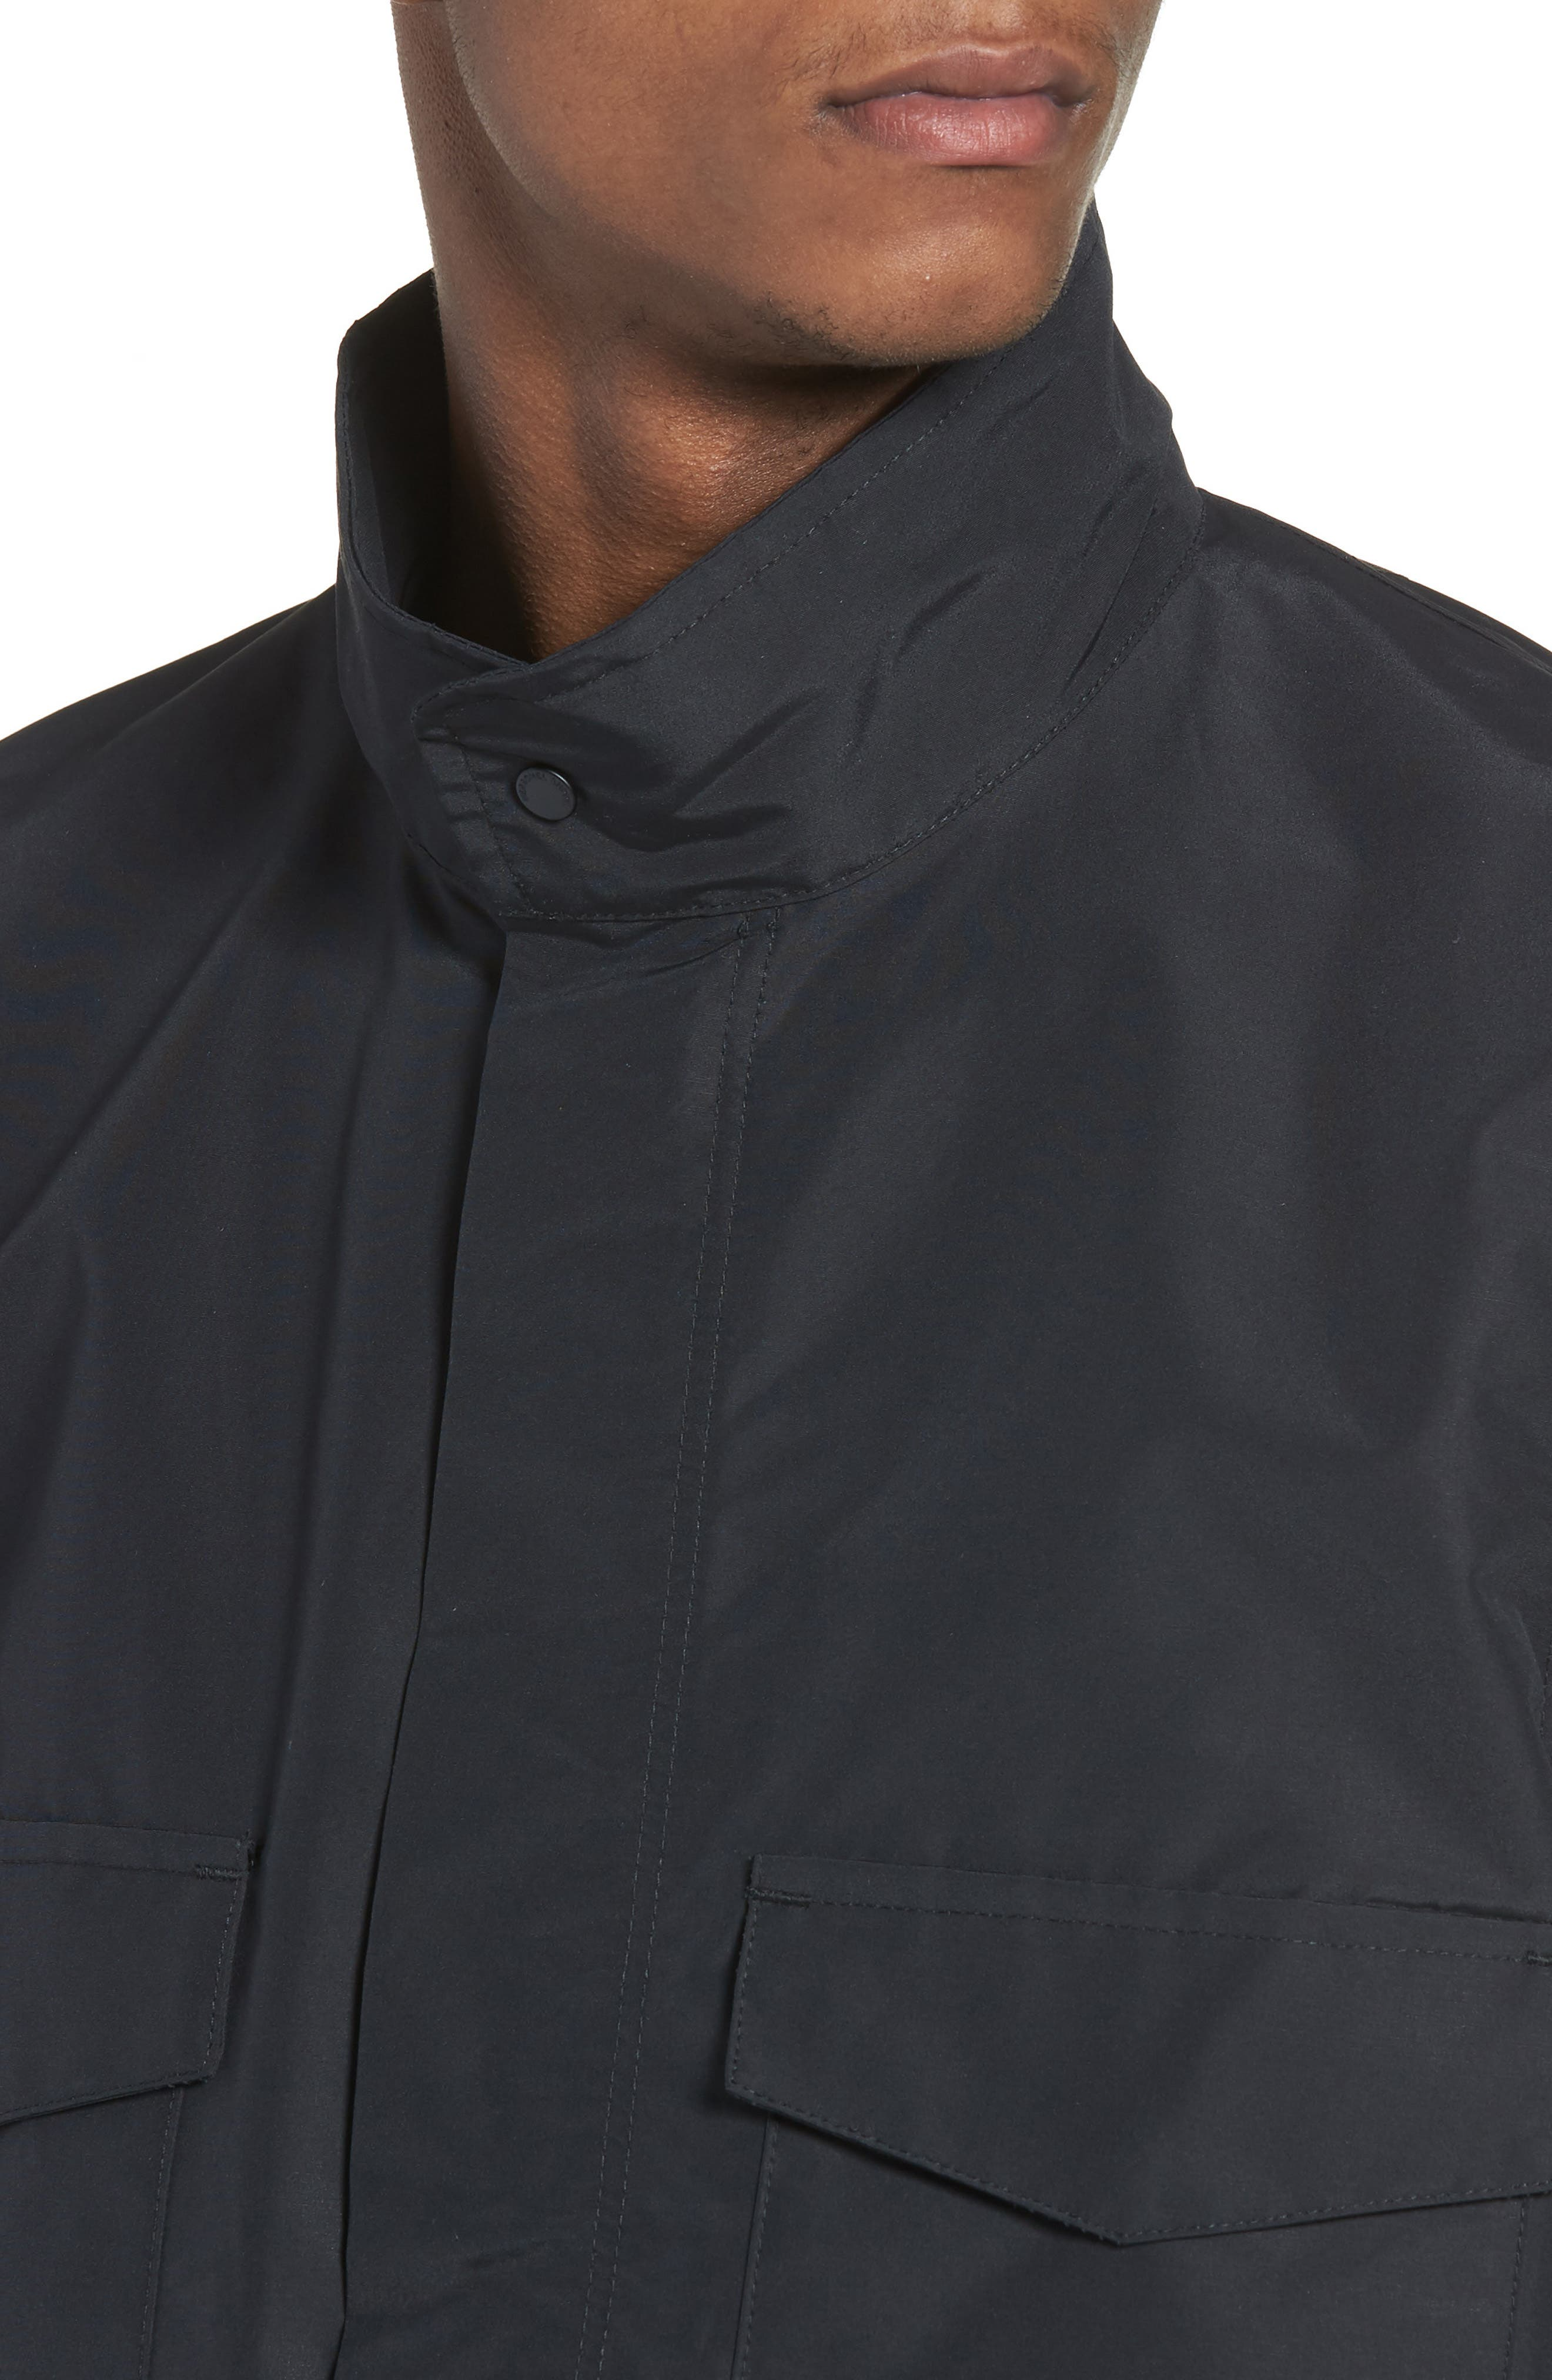 Field Jacket,                             Alternate thumbnail 4, color,                             004